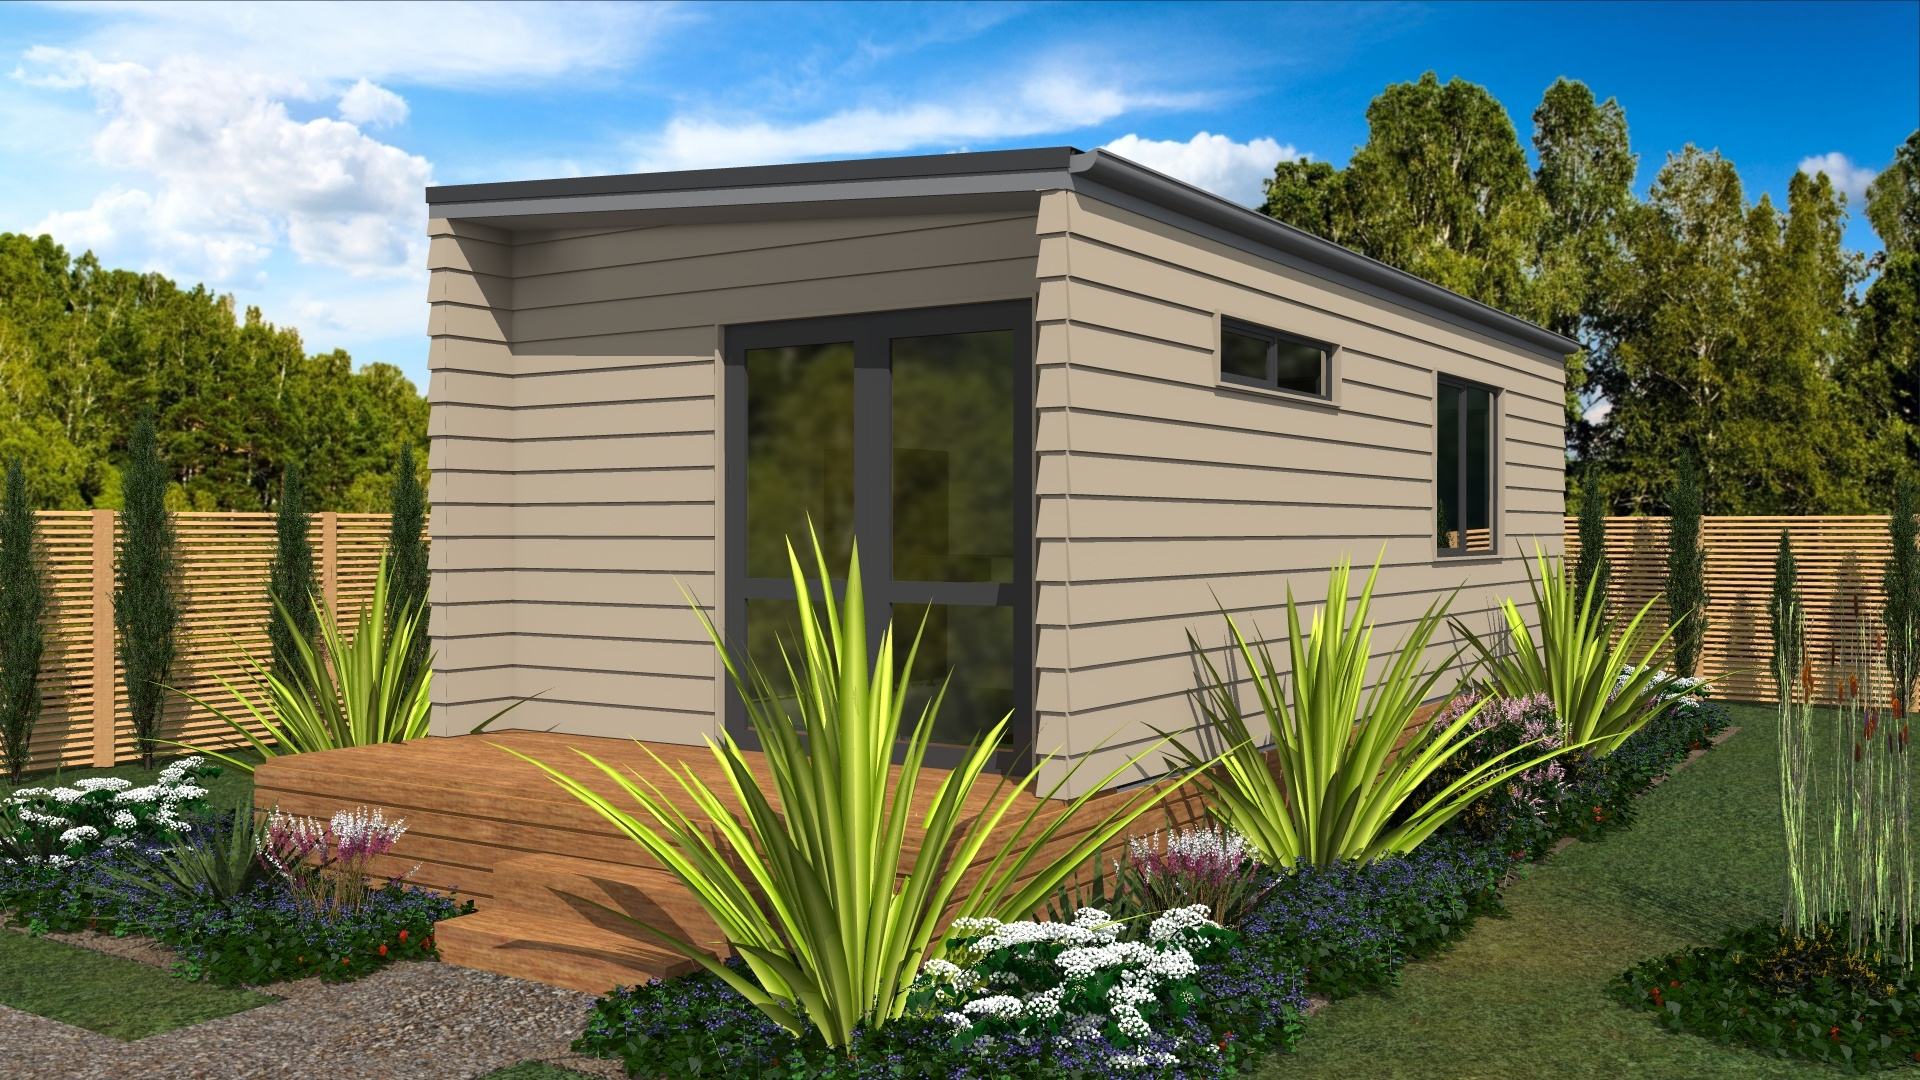 Kiwi 1 bedroom prefabricated